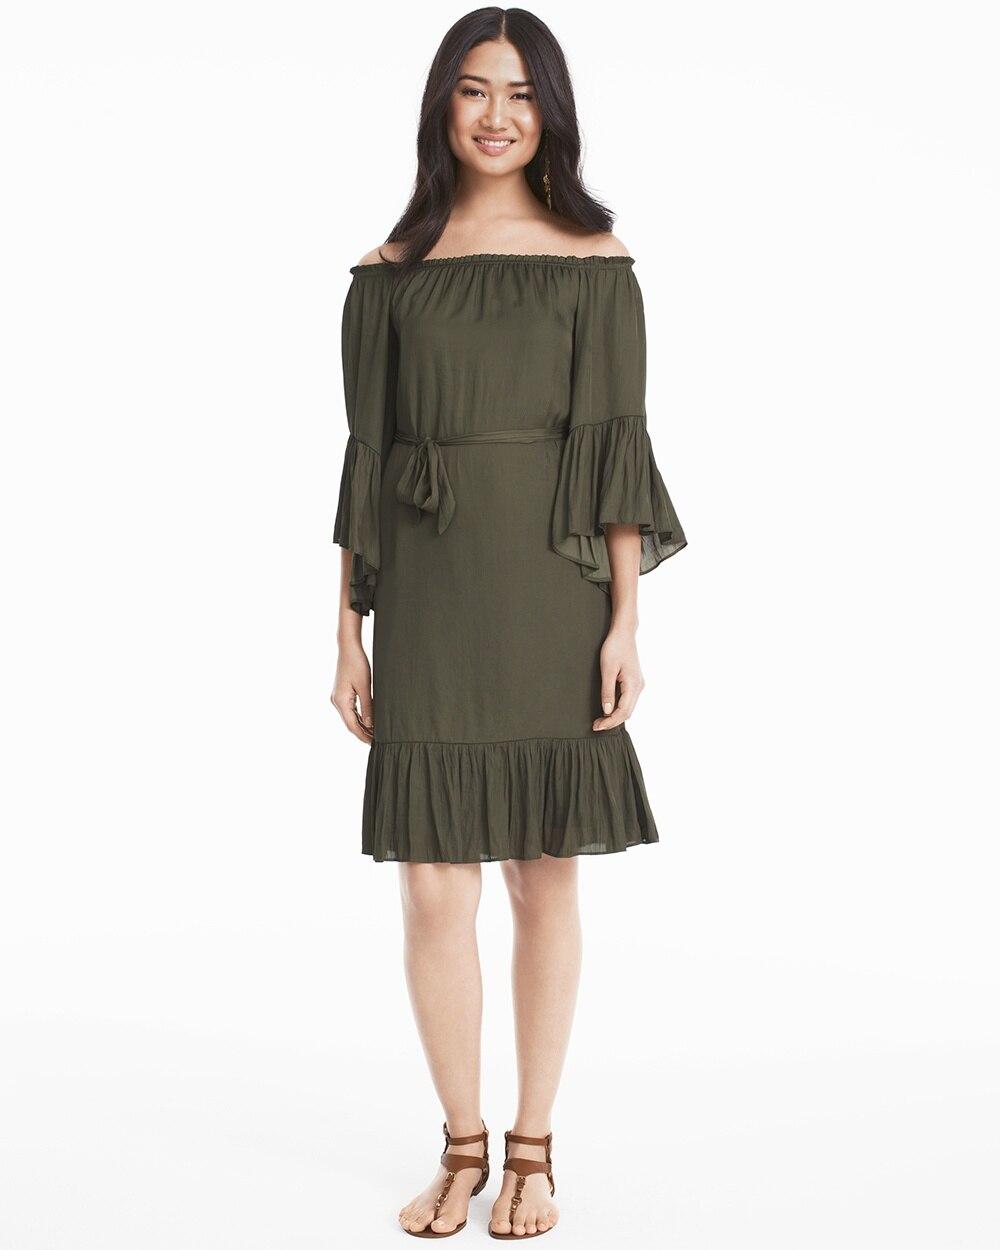 64dedaaebe5e Olive Green Off-the-Shoulder Flounce Dress - White House Black Market